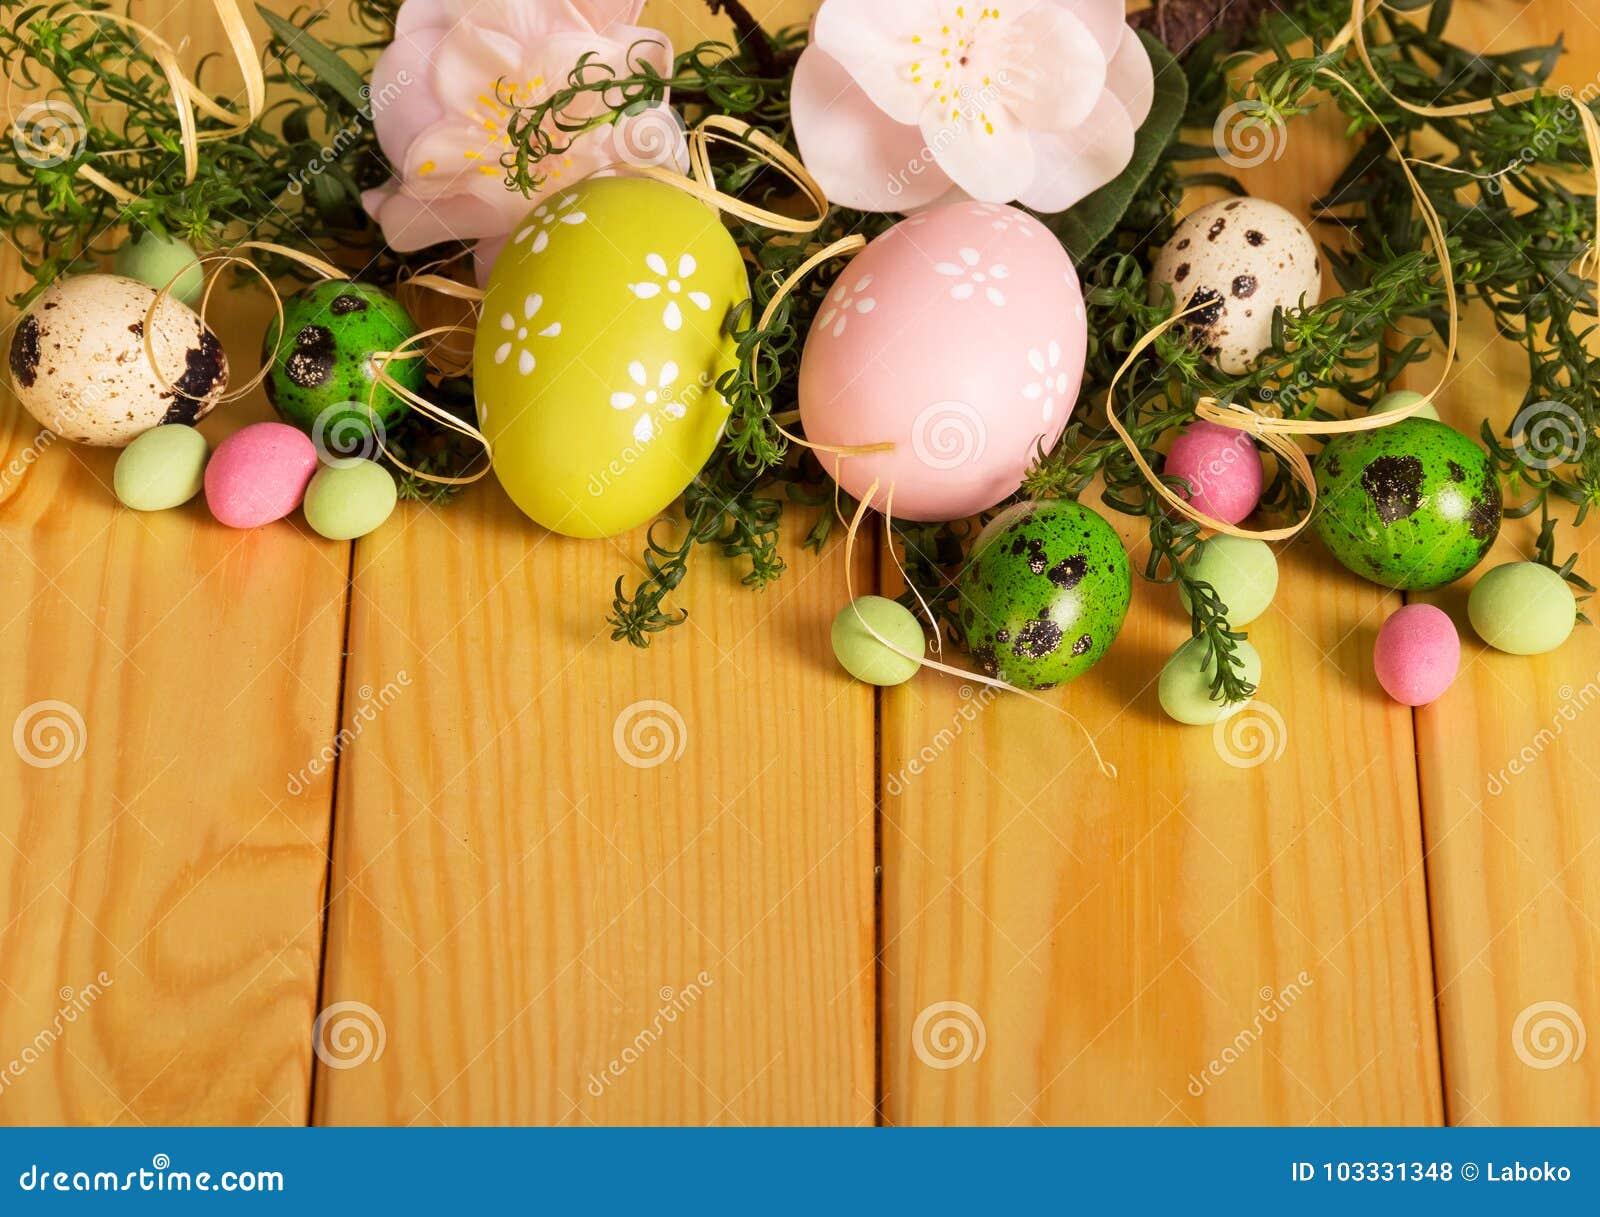 Huevos de Pascua coloreados, flores, cinta del caramelo, contra el contexto PAL